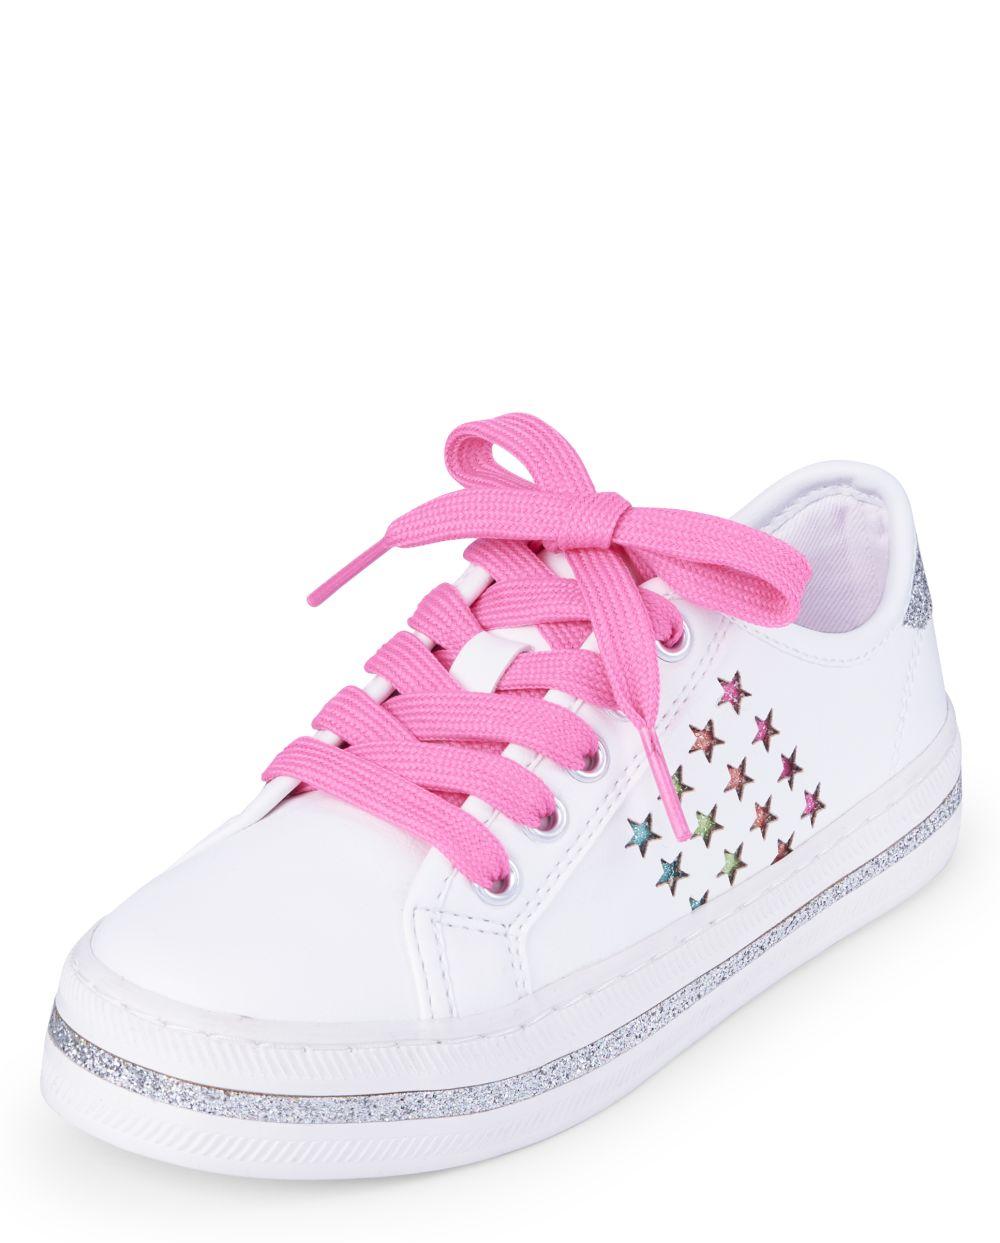 Glitter Rainbow Stars Low Top Sneakers - White